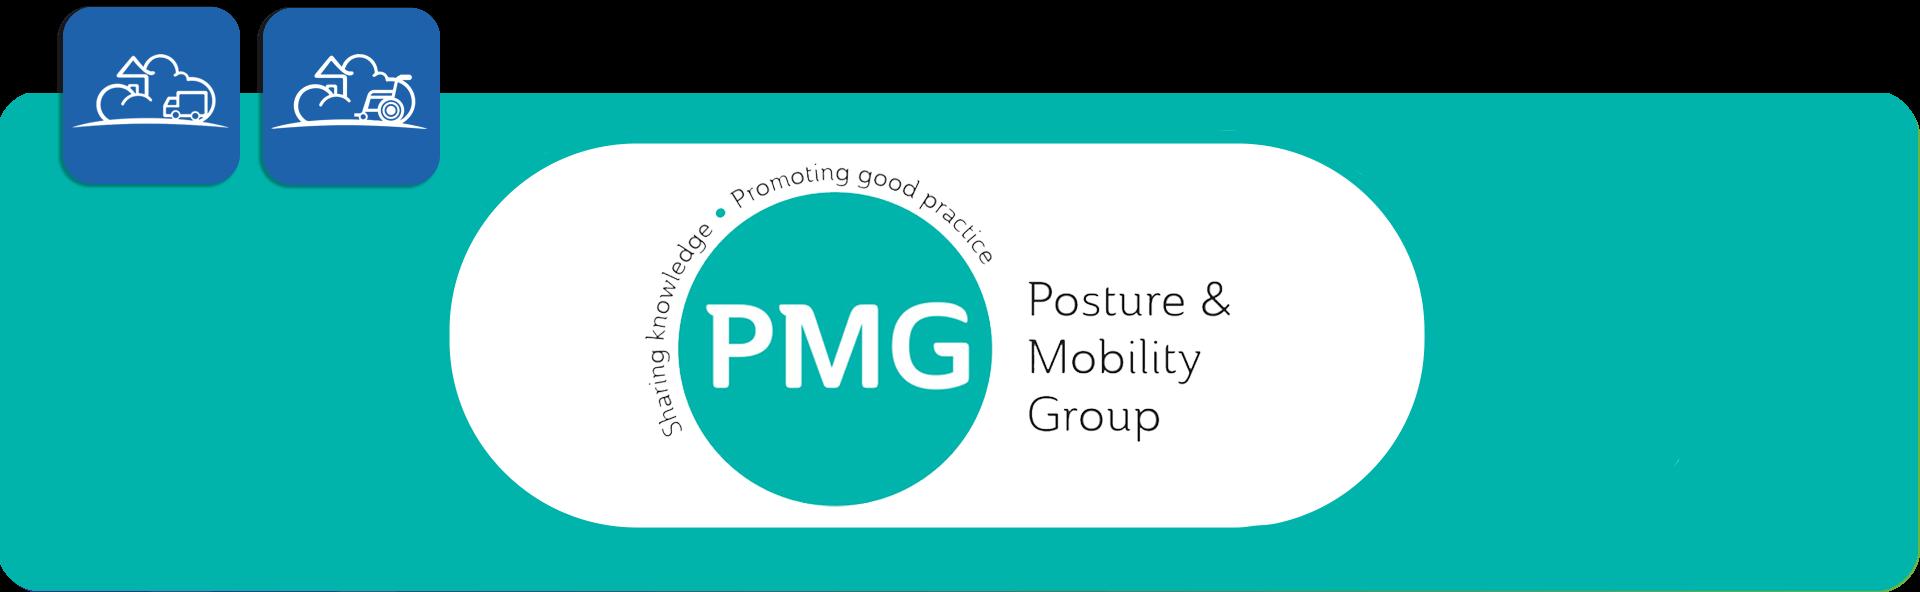 posture & mobility group logo